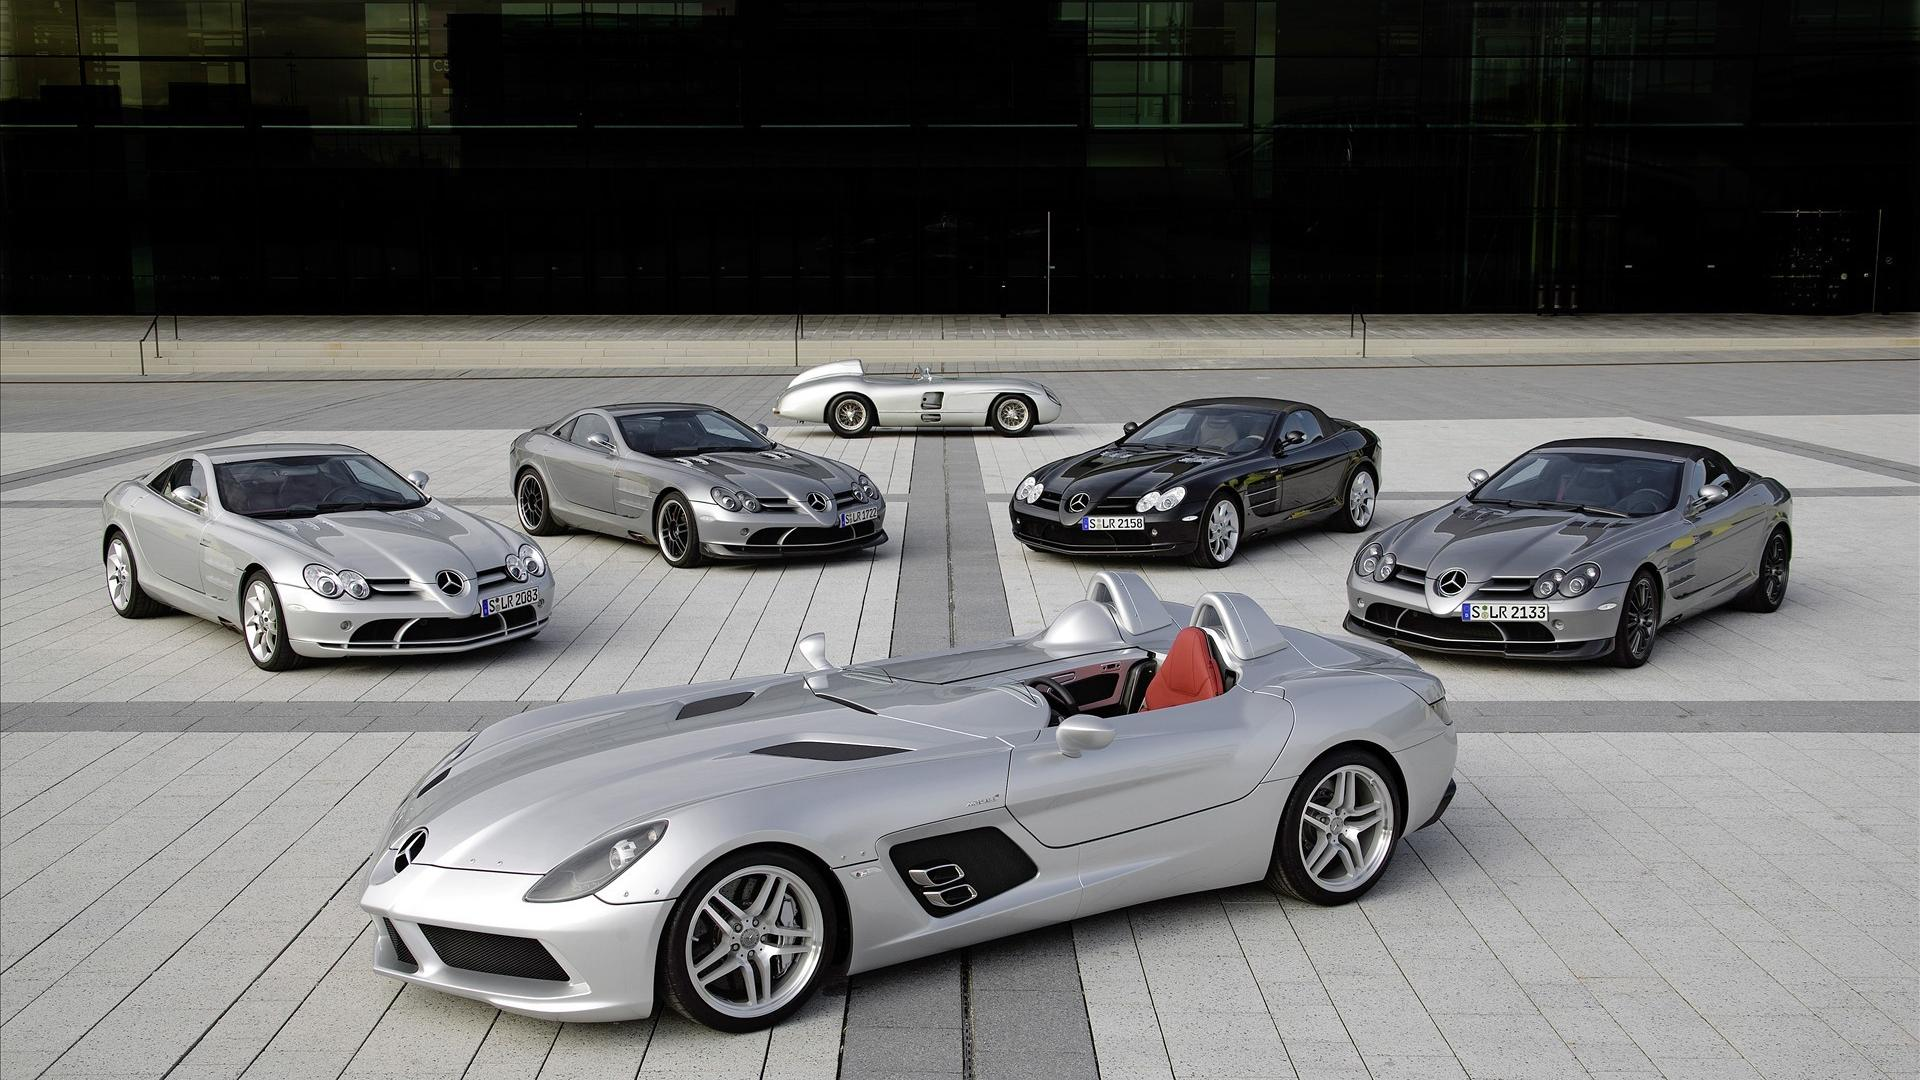 car mercedes benz slr wallpapers - Mercedes Benz Slr Wallpaper Hd